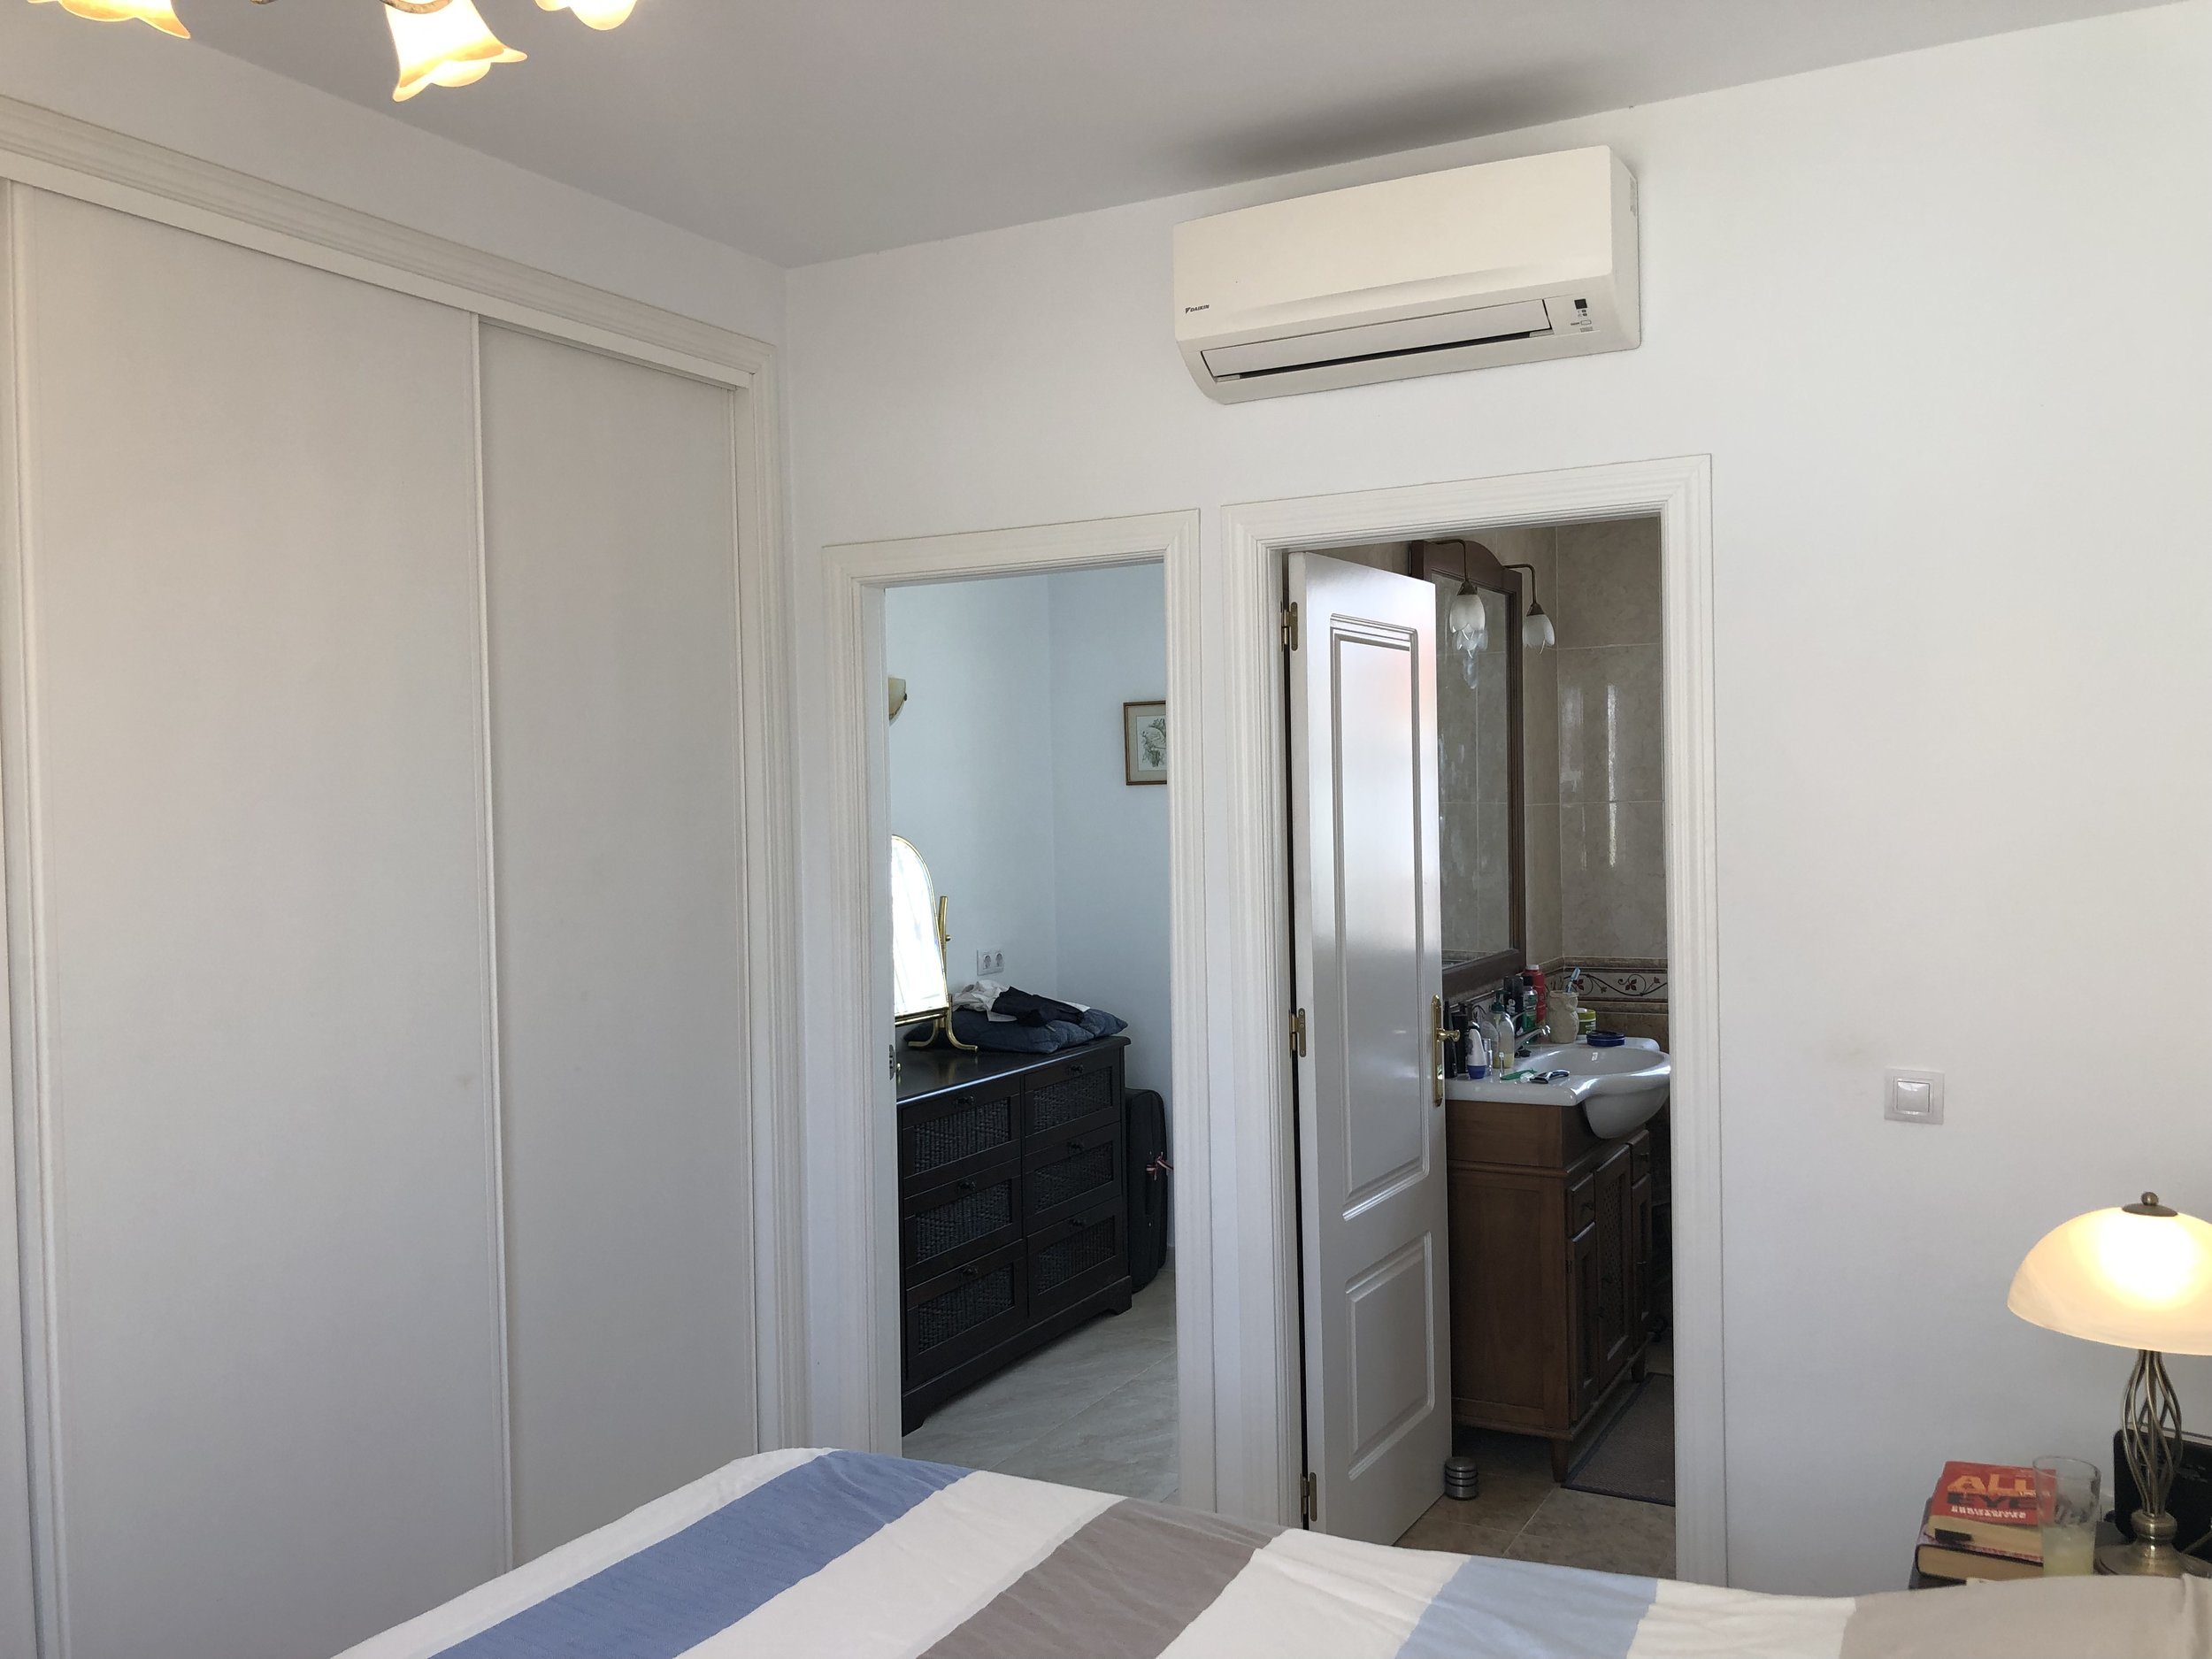 Copy of Copy of Master Bedroom